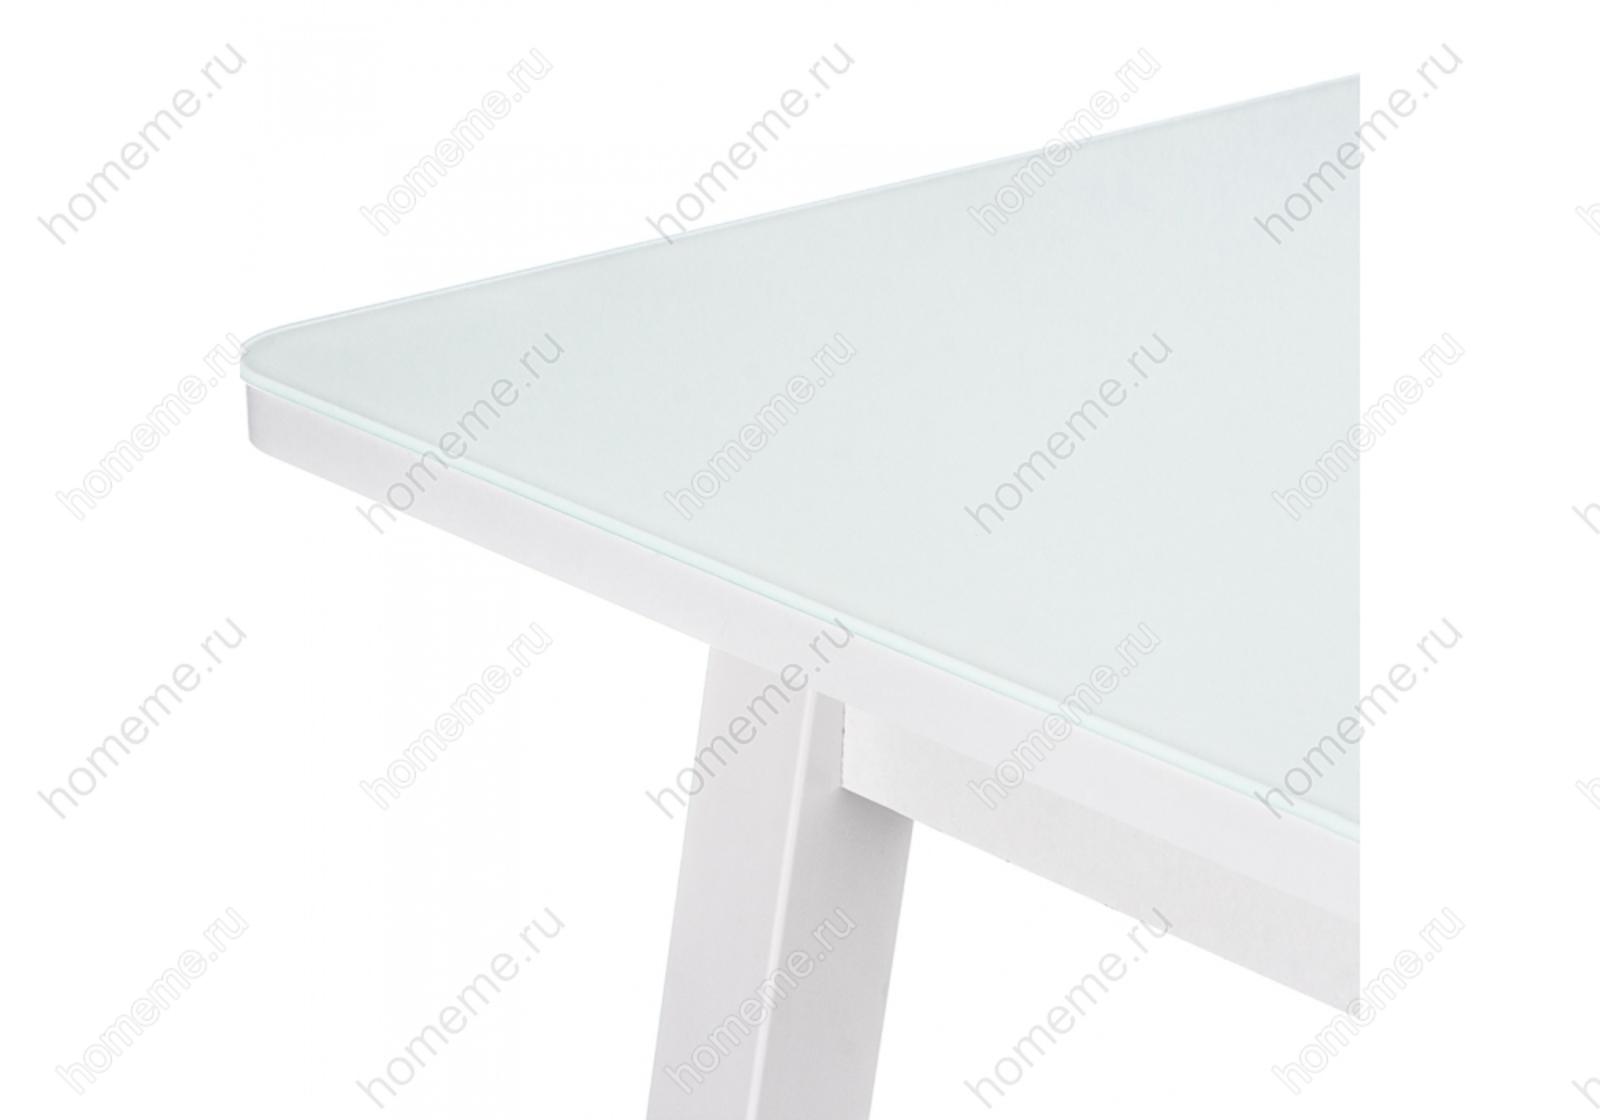 Стол стеклянный со стеклом Ланс 110 белый 302668 со стеклом Ланс 110 белый 302668 (15316)